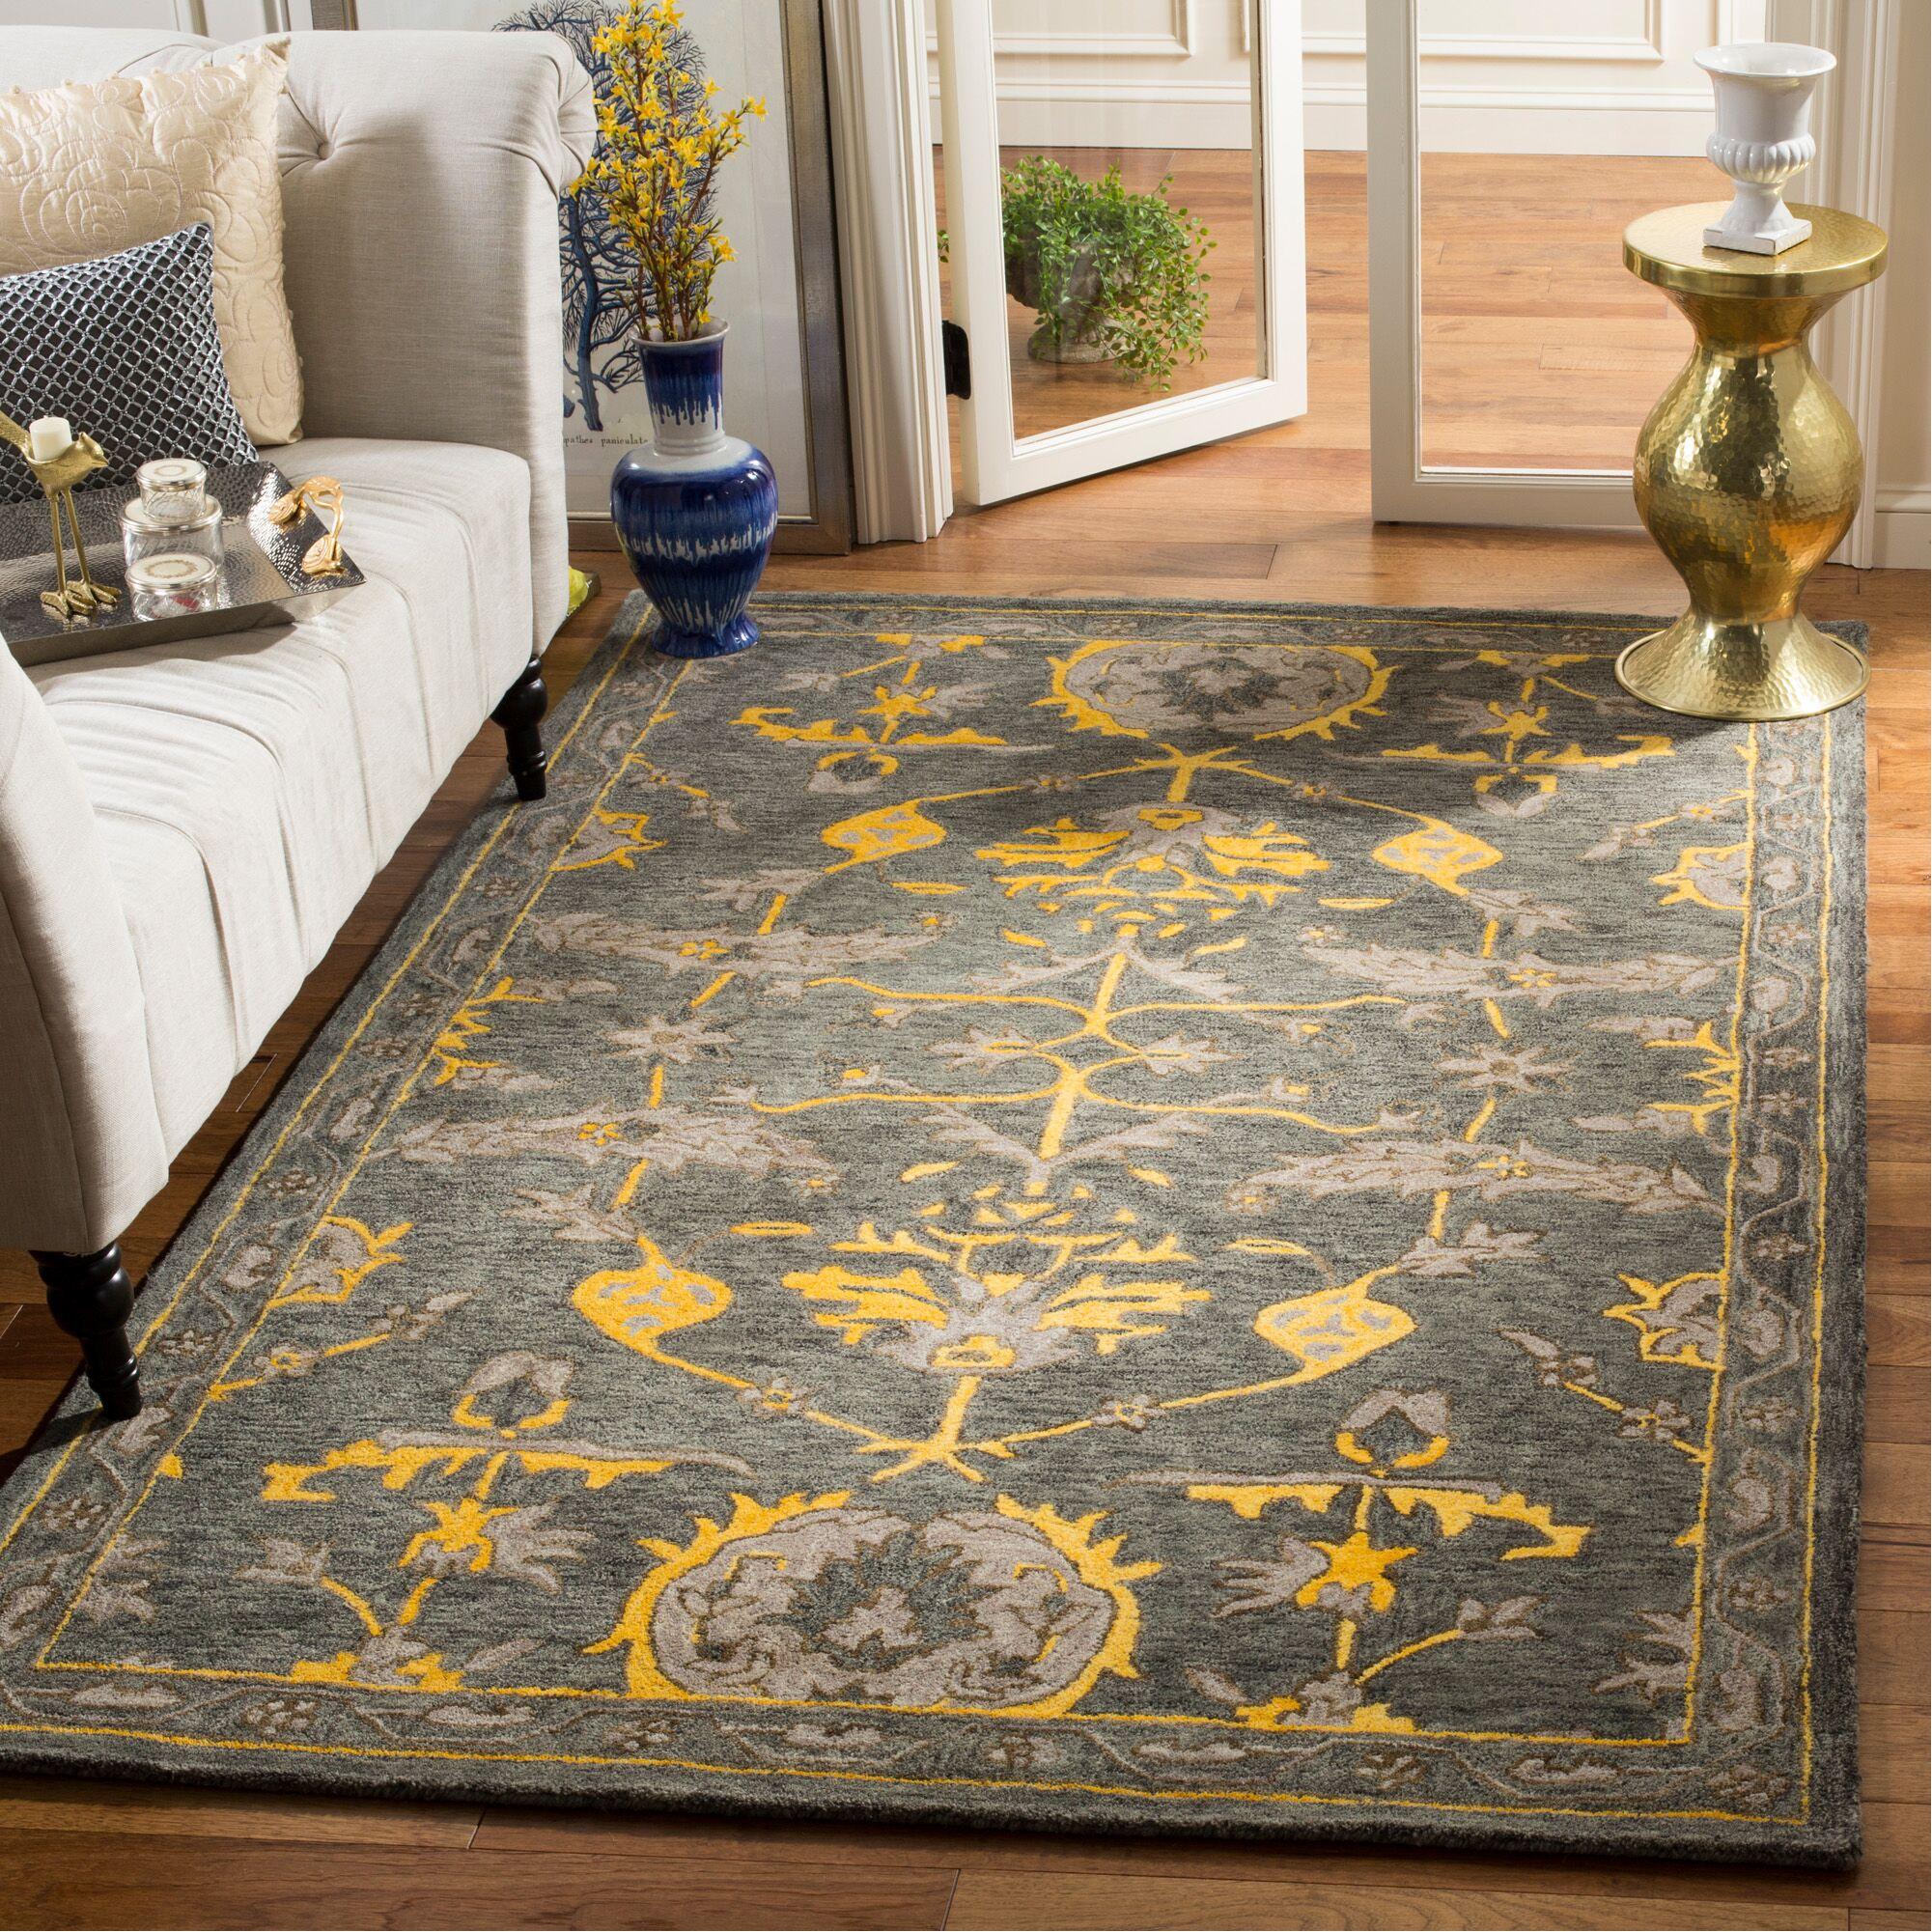 Netea Hand-Tufted Blue Grey/Gold Area Rug Rug Size: Rectangle 5' x 8'